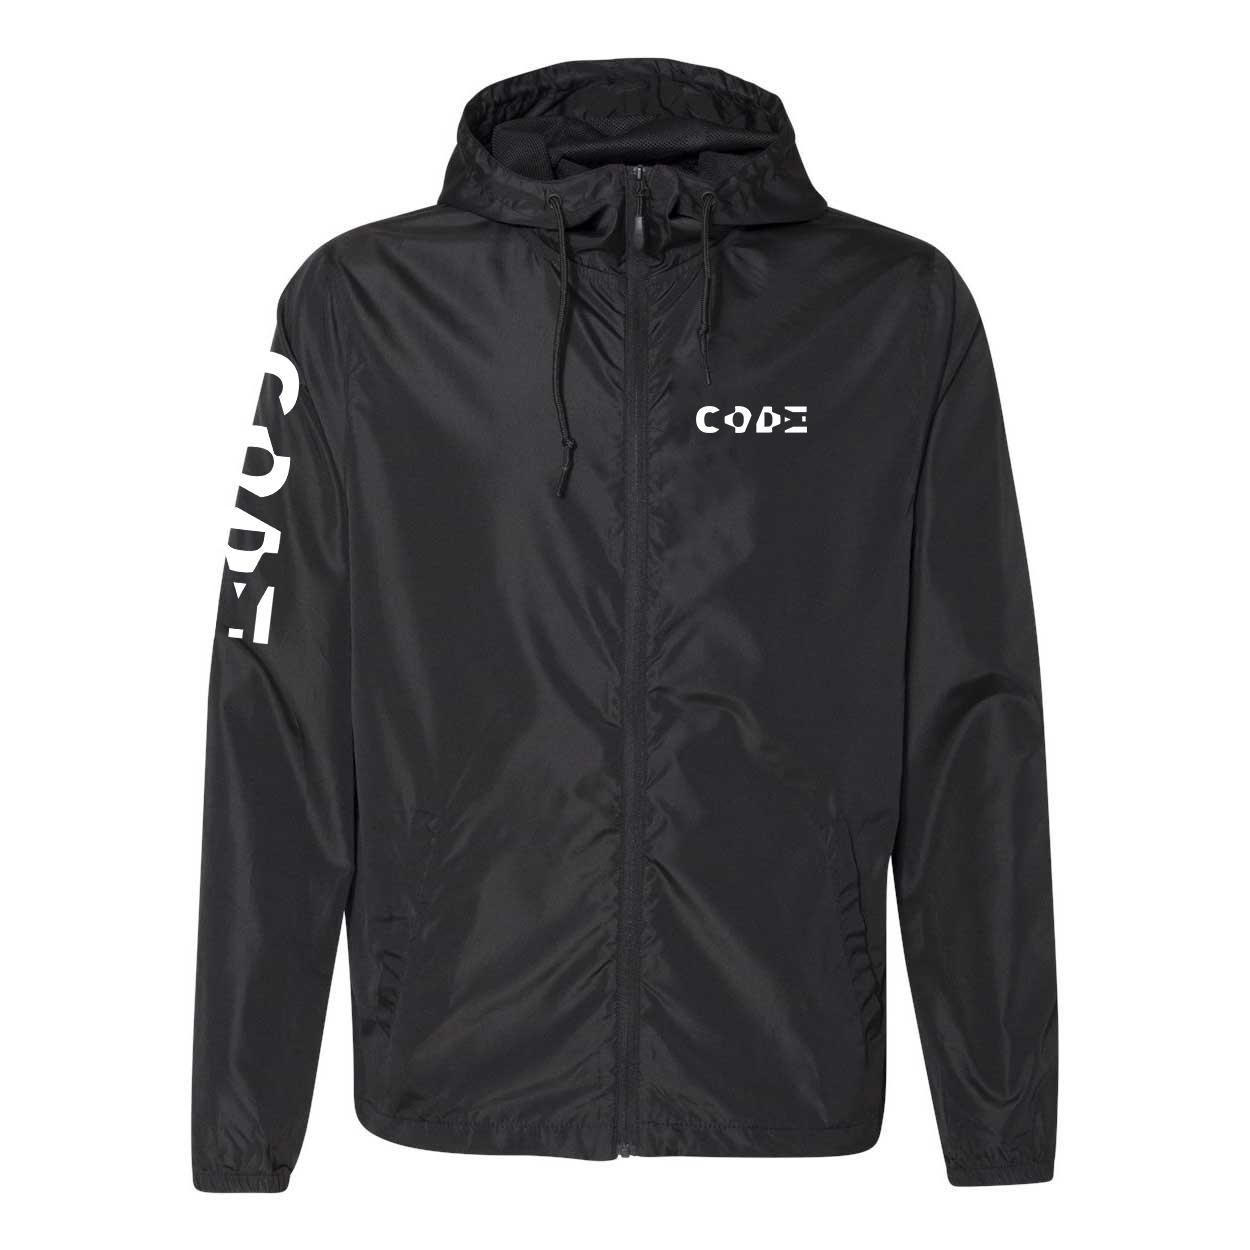 Code Tag Logo Classic Lightweight Windbreaker Black (White Logo)